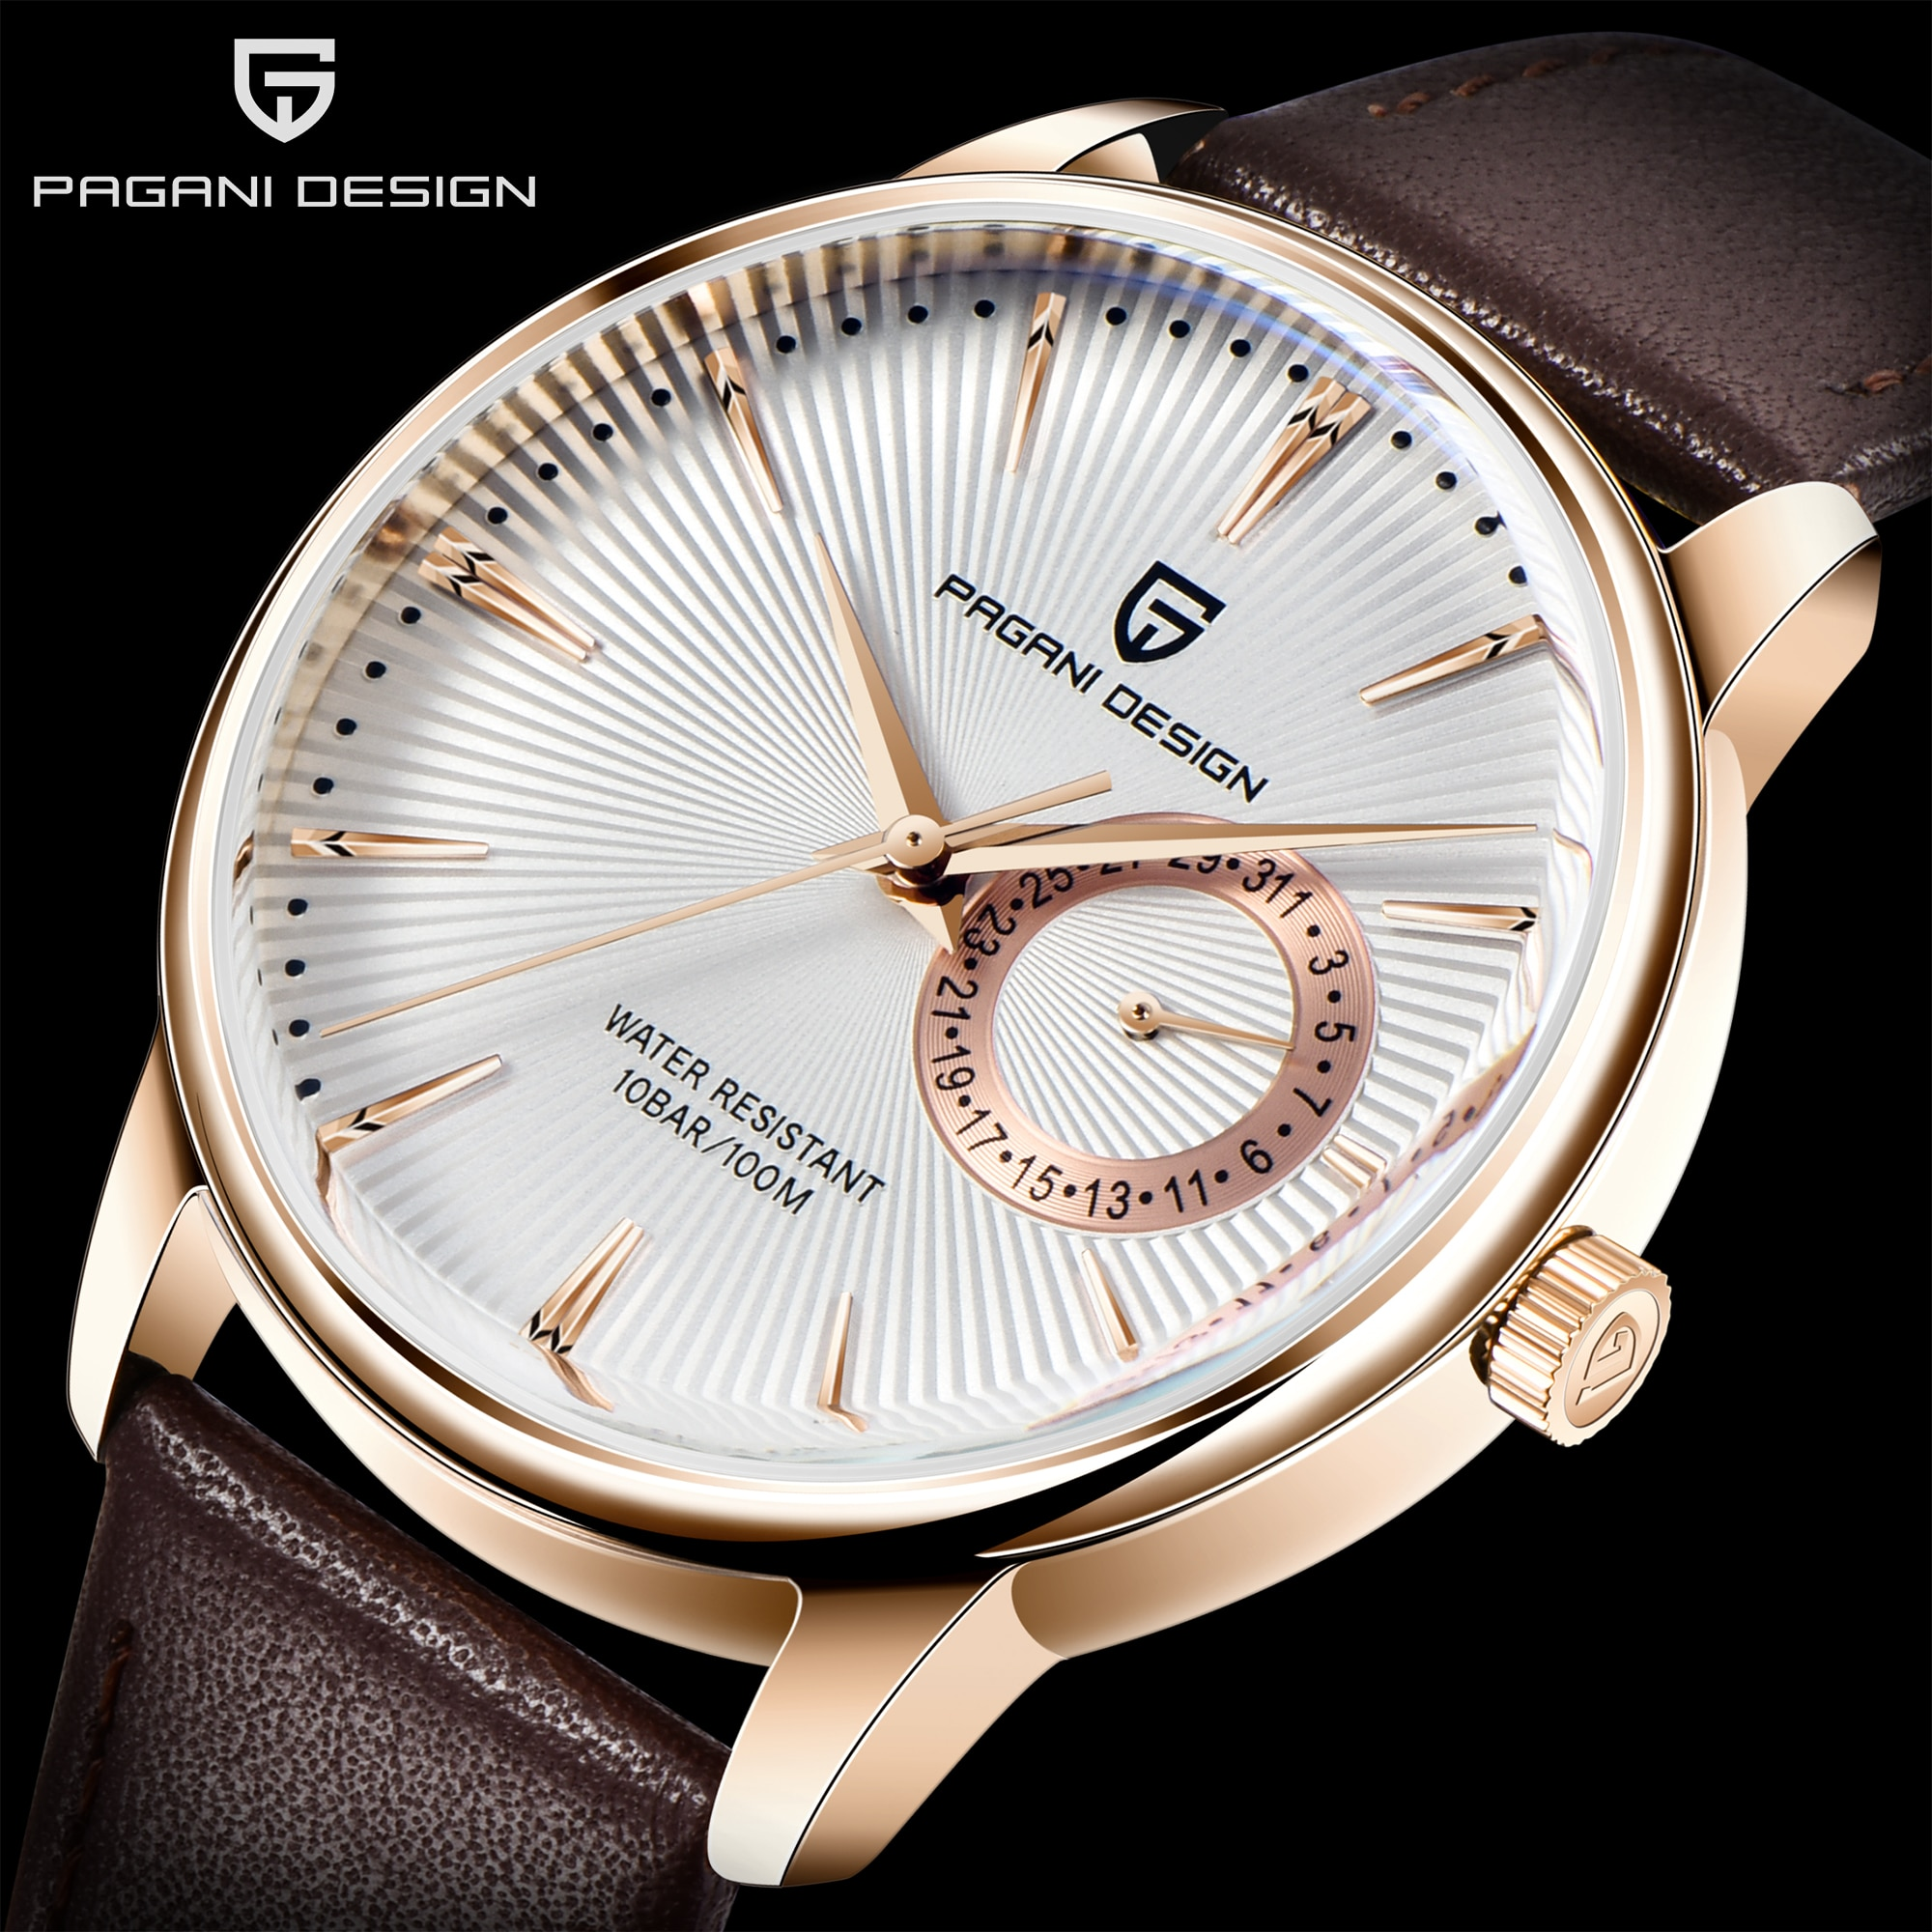 2021 PAGANI DESIGN Top Brand Luxury Waterproof Men Quartz Watch Fashion Casual Sports Watch Men Military Watch Relogio Masculino